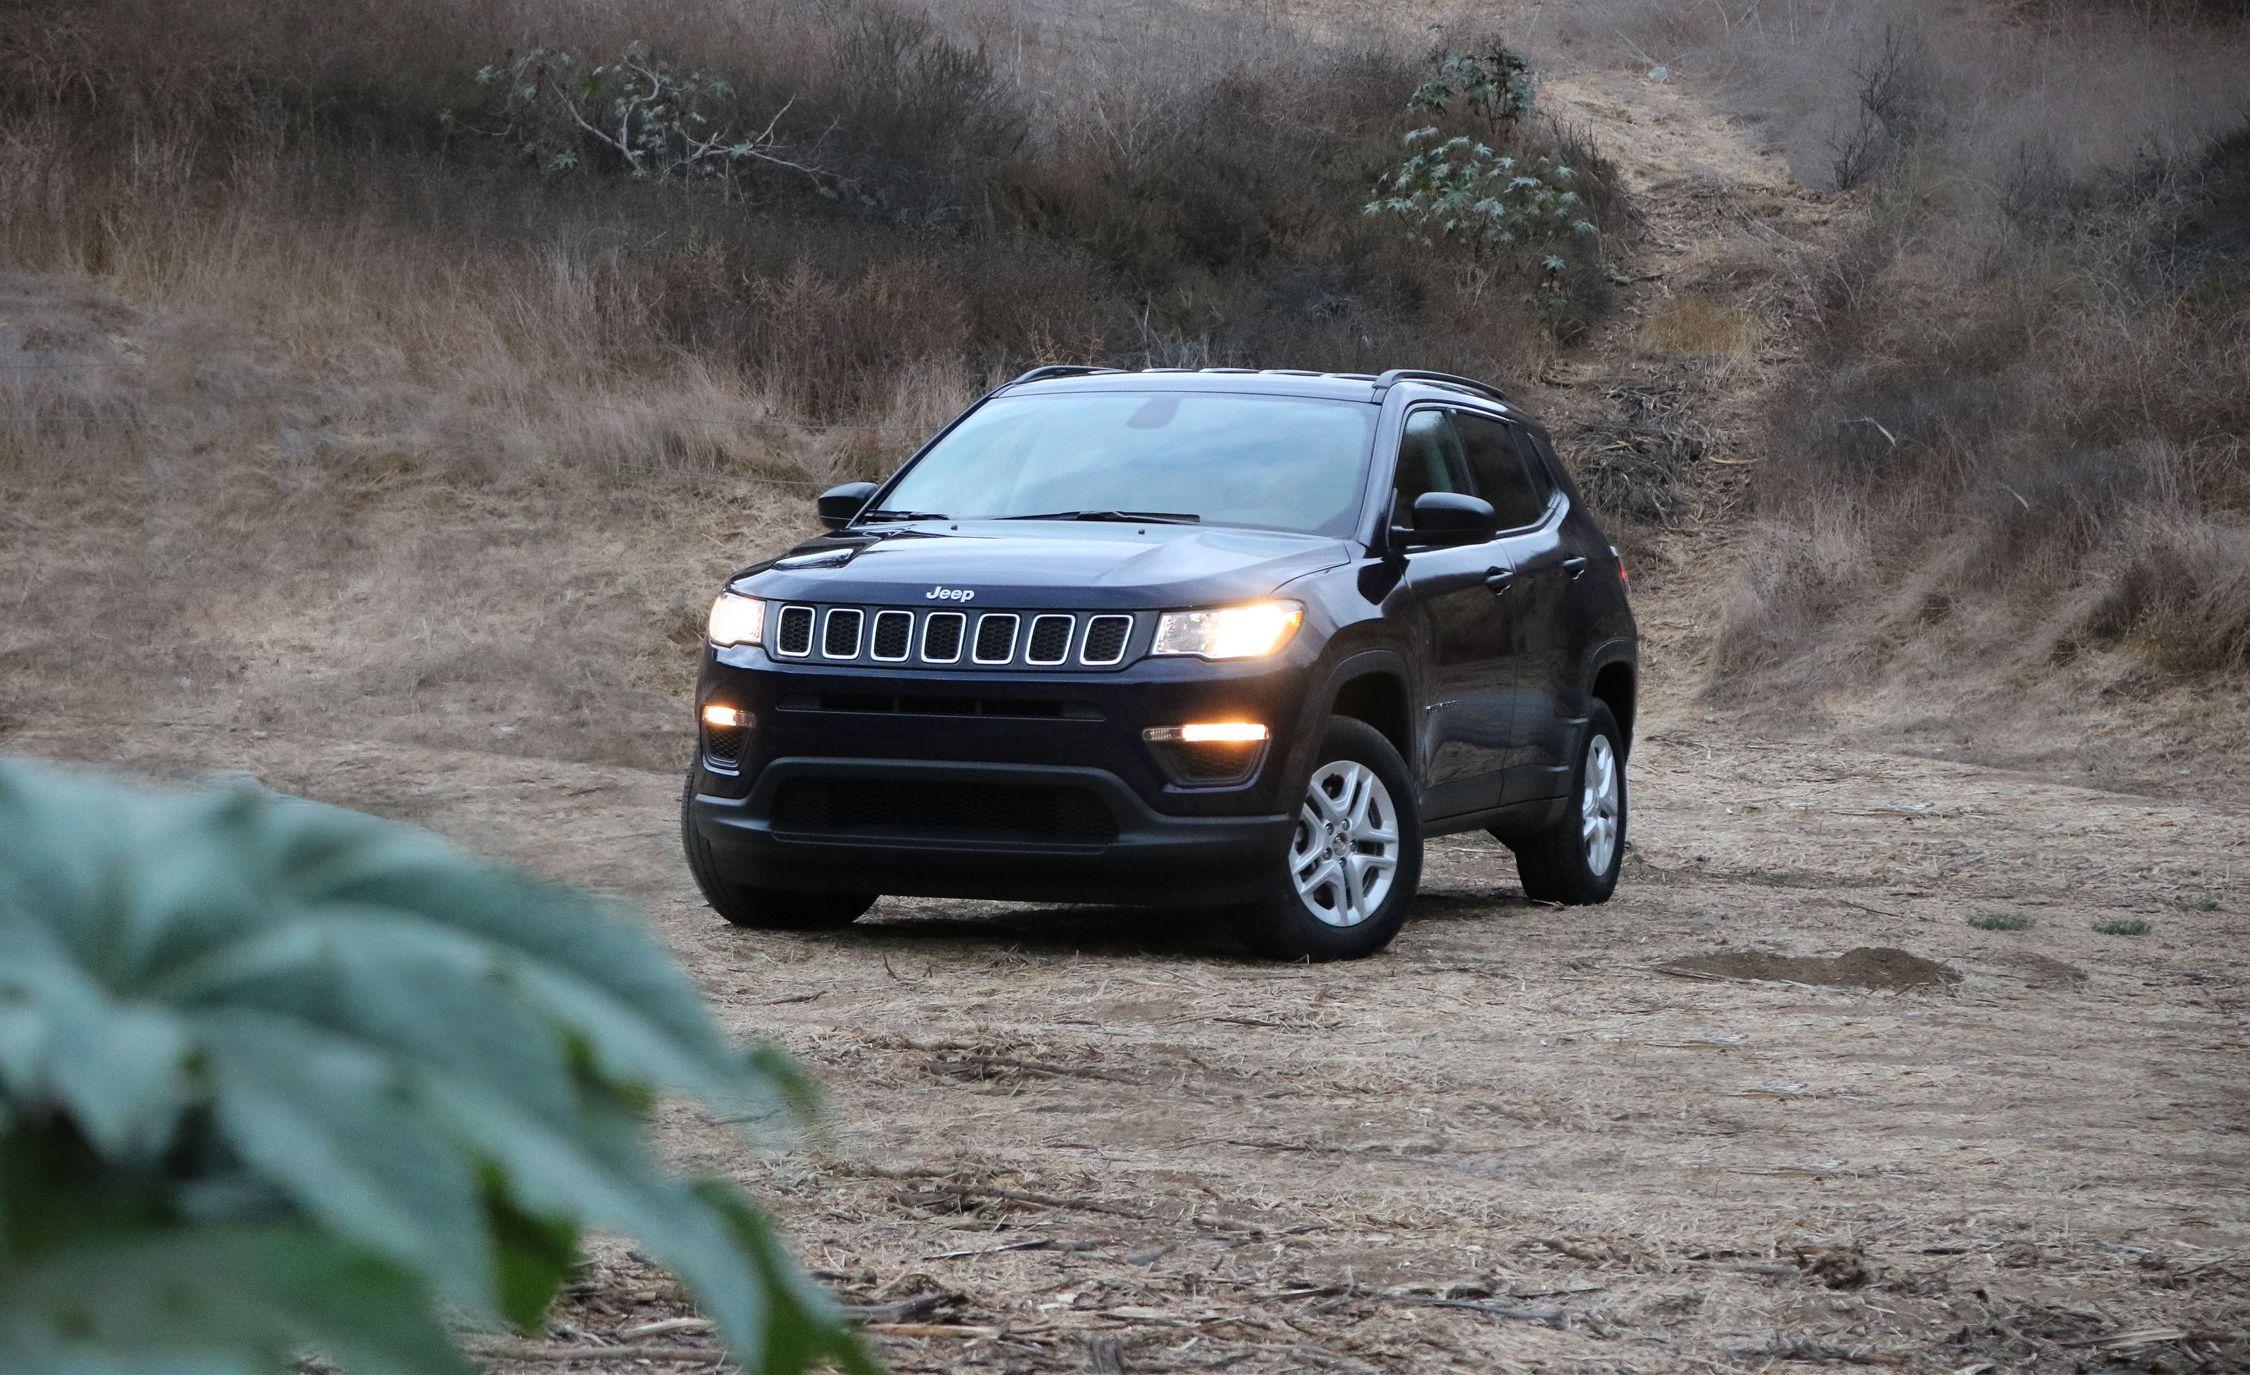 2017 Jeep Compass 4x4 Manual